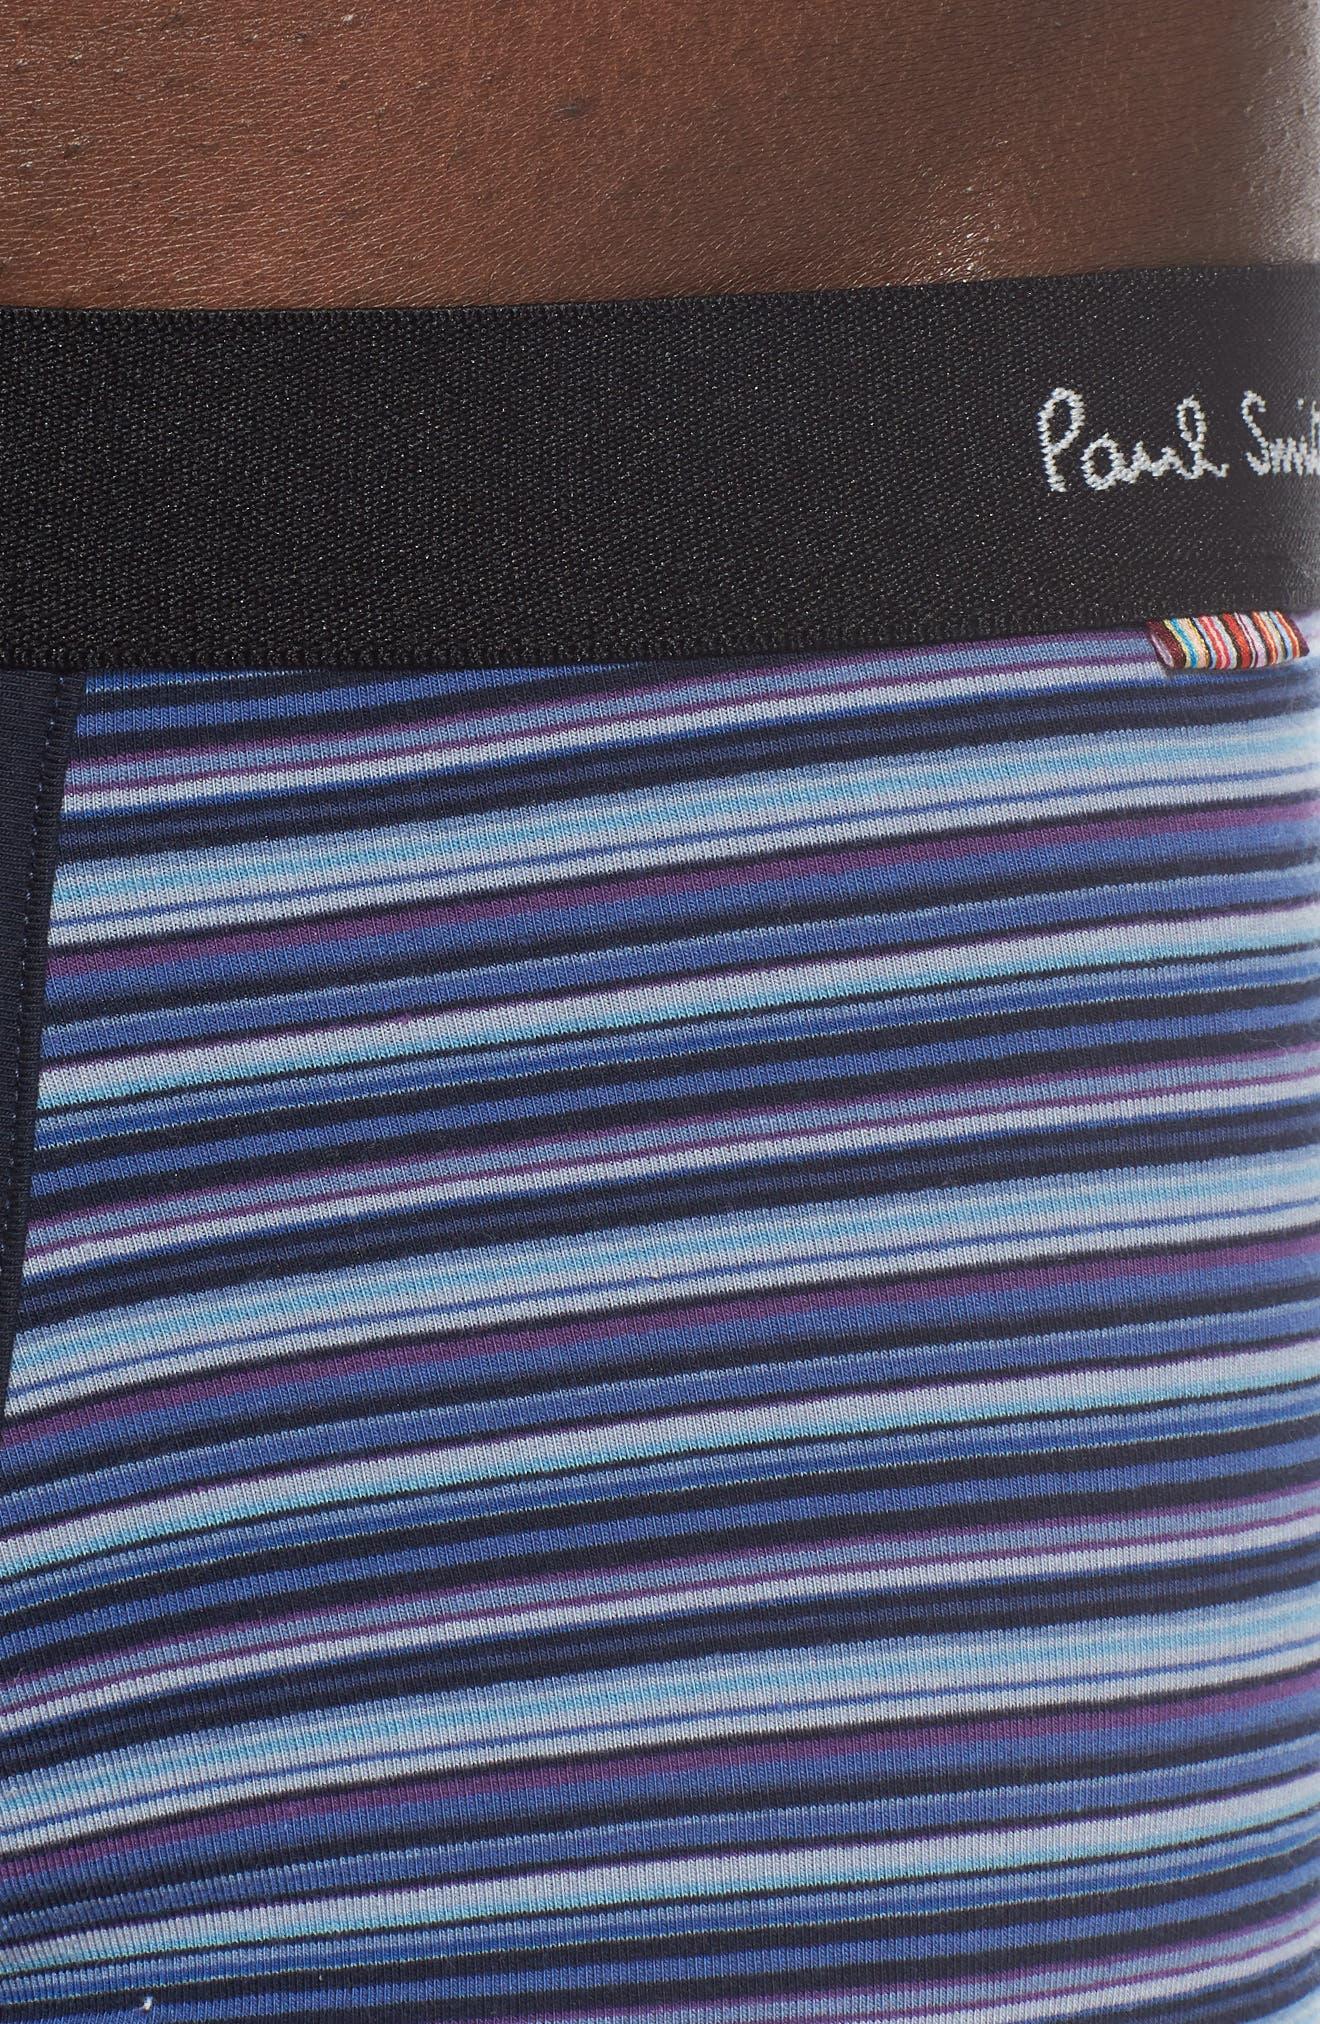 PAUL SMITH, Stripe Trunks, Alternate thumbnail 4, color, BLACK